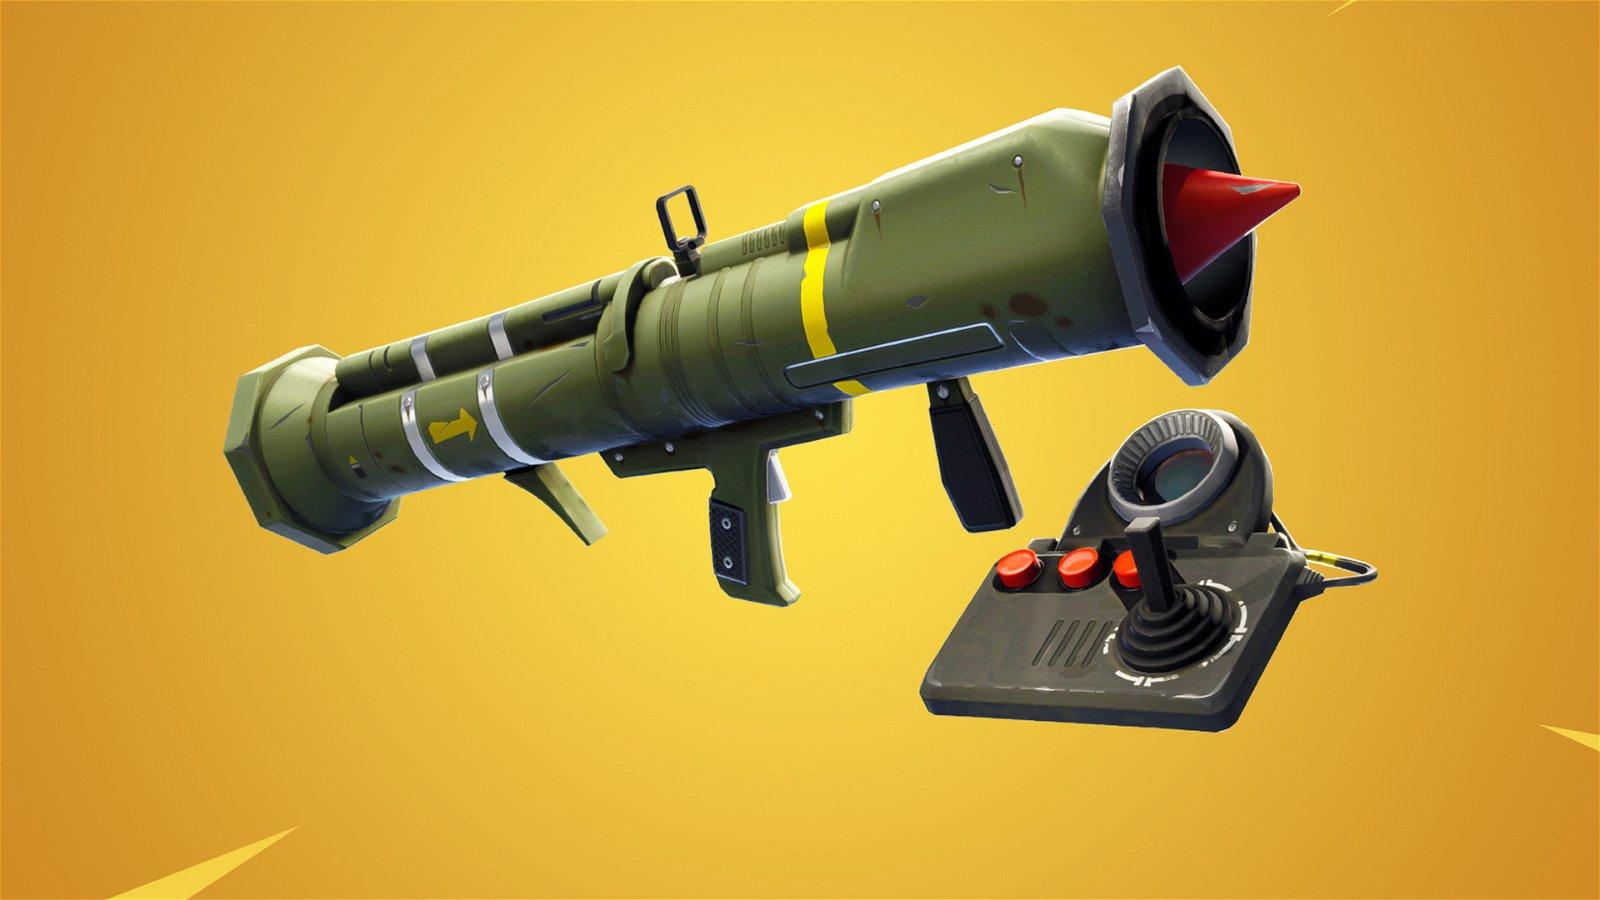 Fortnite Wrecks Havoc With Explosive Content Update 1